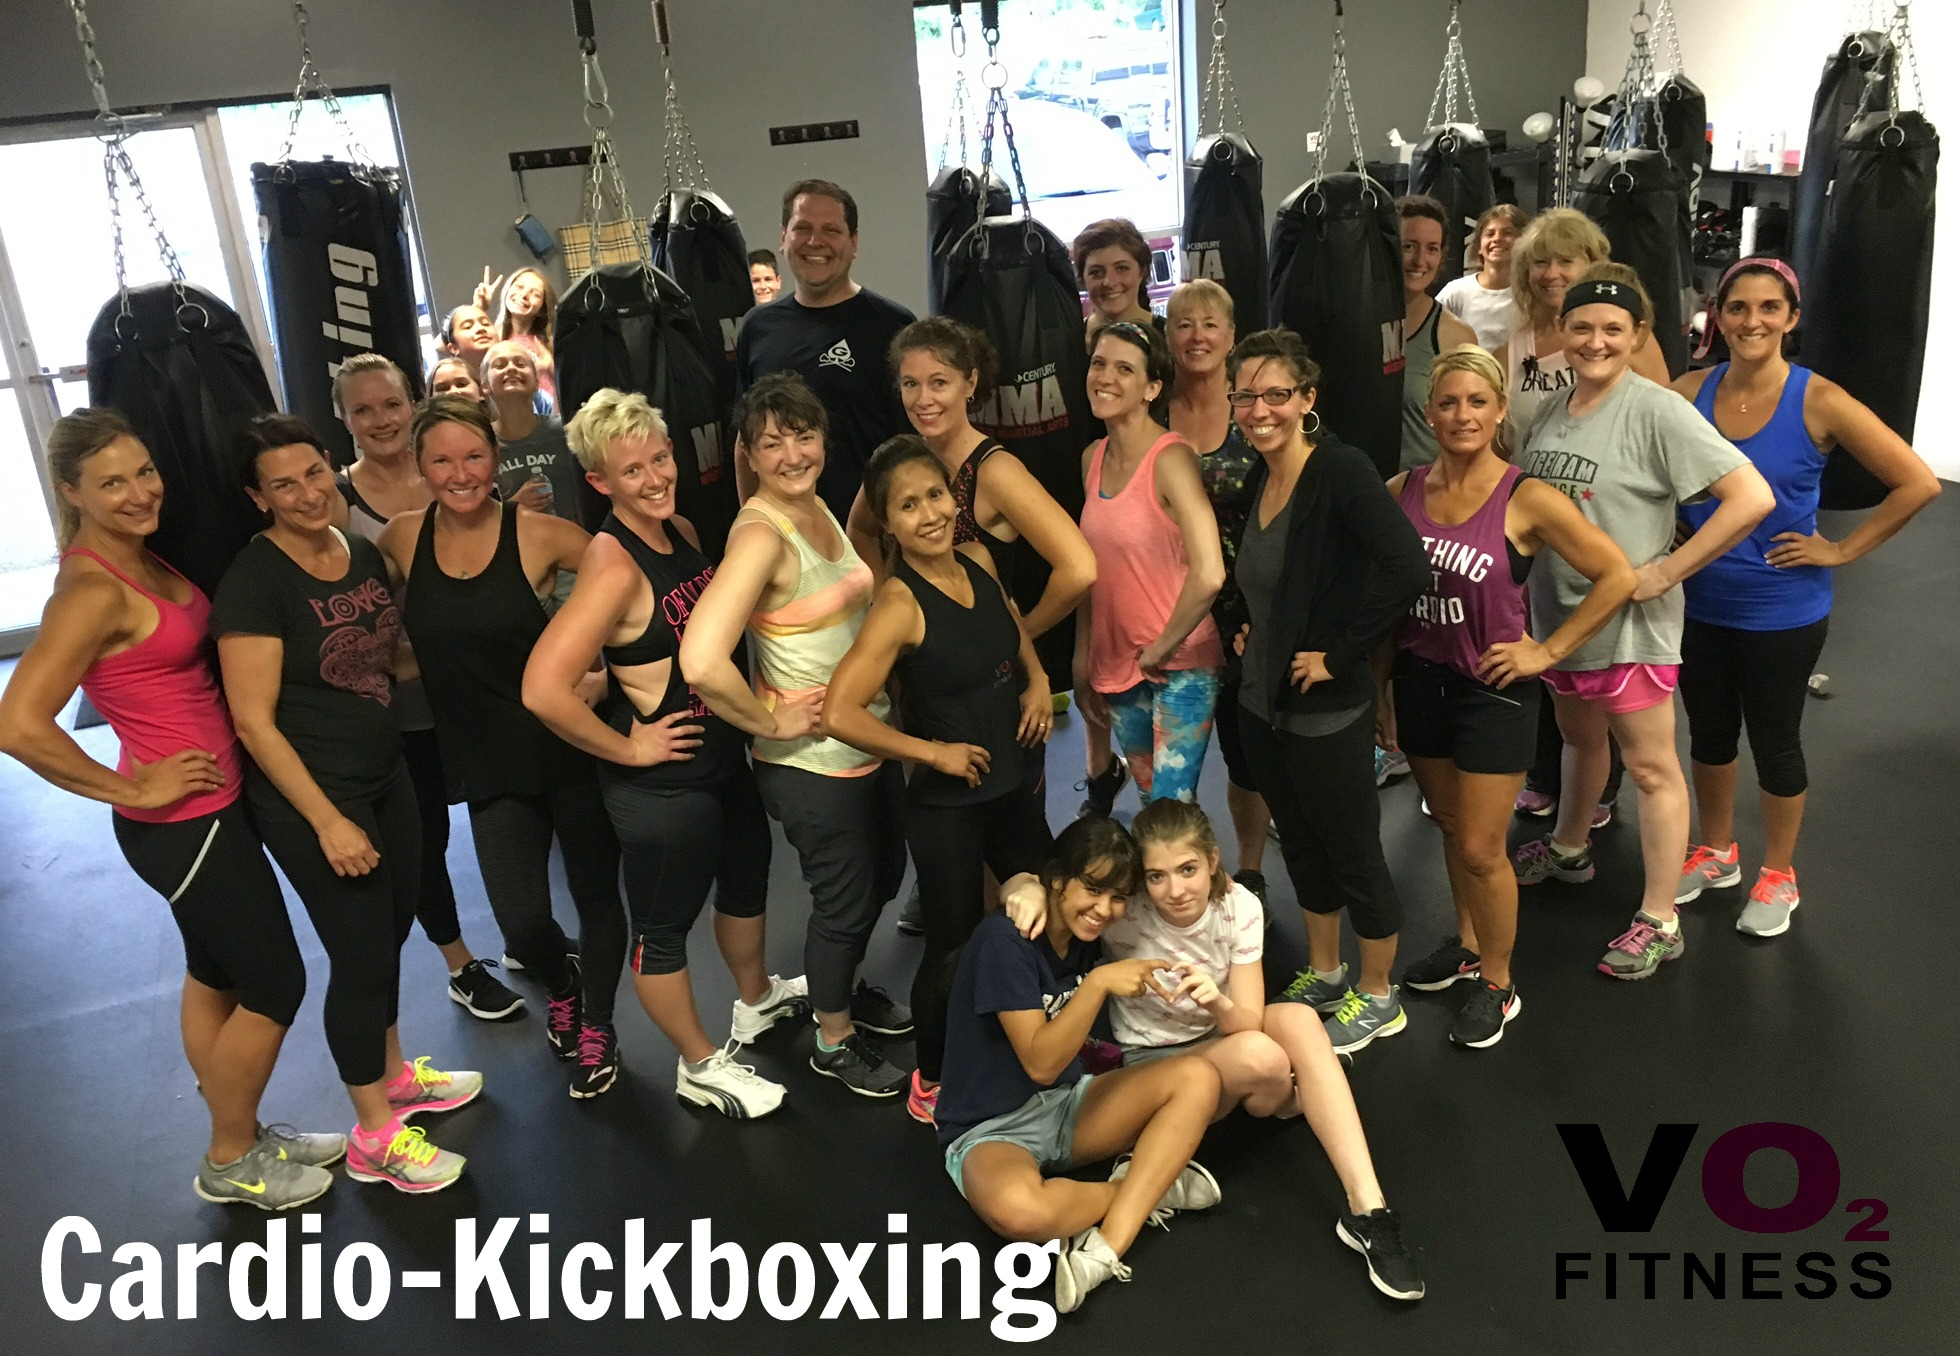 Cardio-Kickboxing with Sally